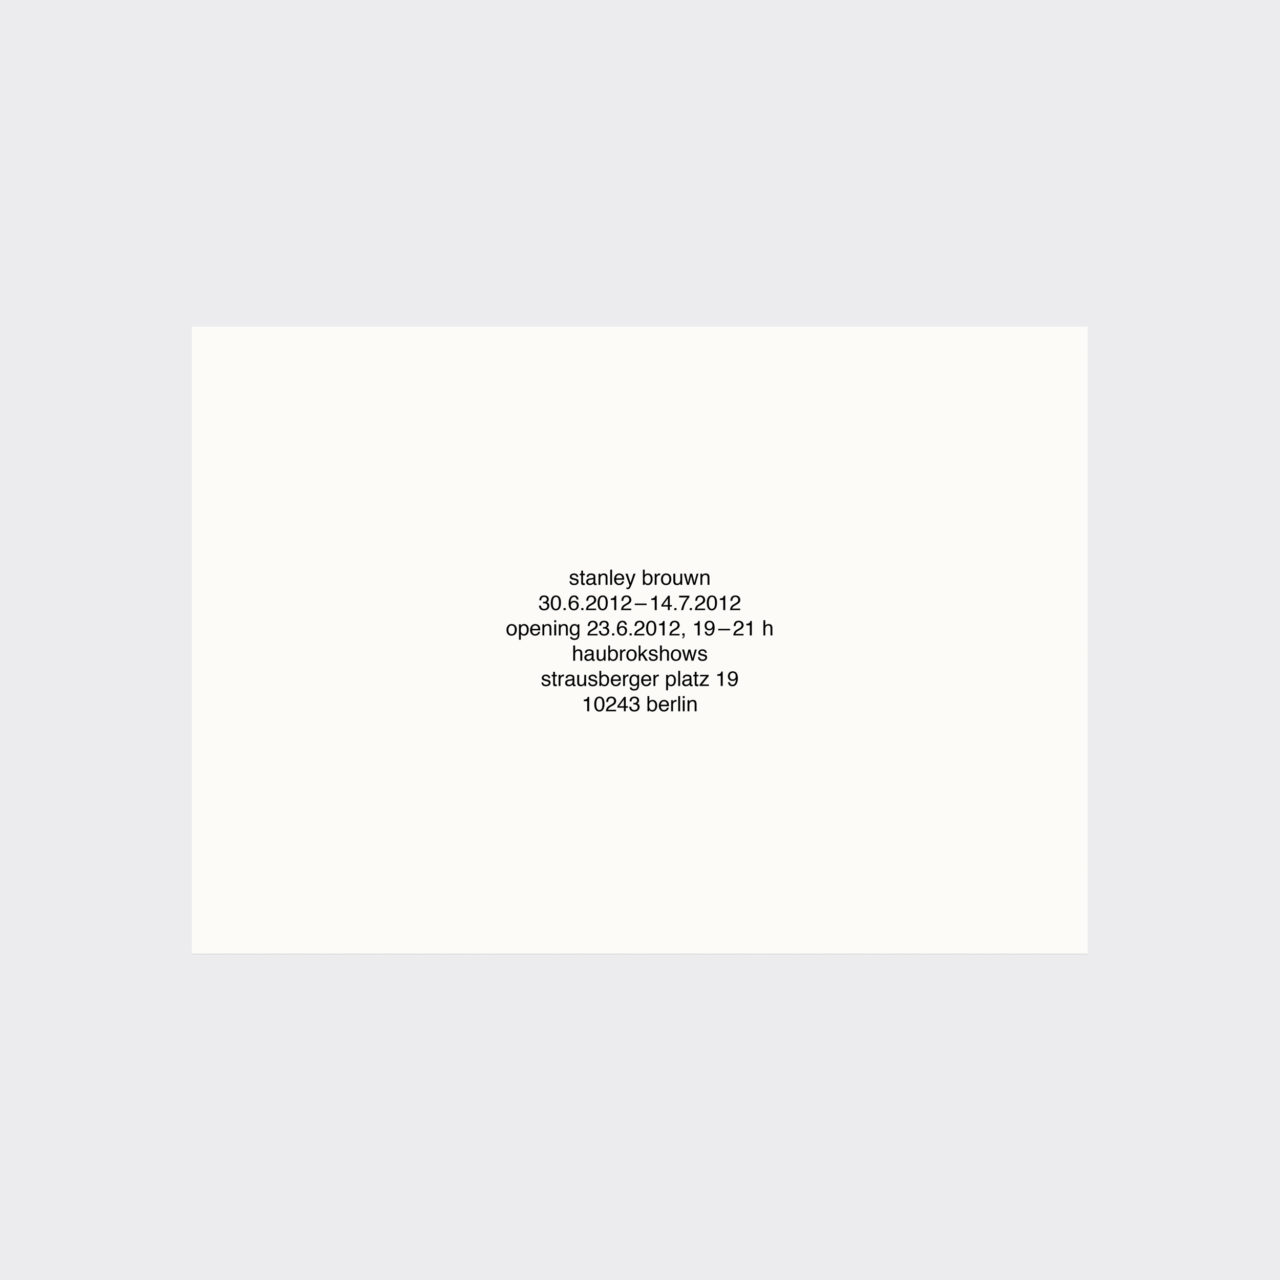 Stanley Brouwn, Stanley Brouwn (announcement card) (2012)